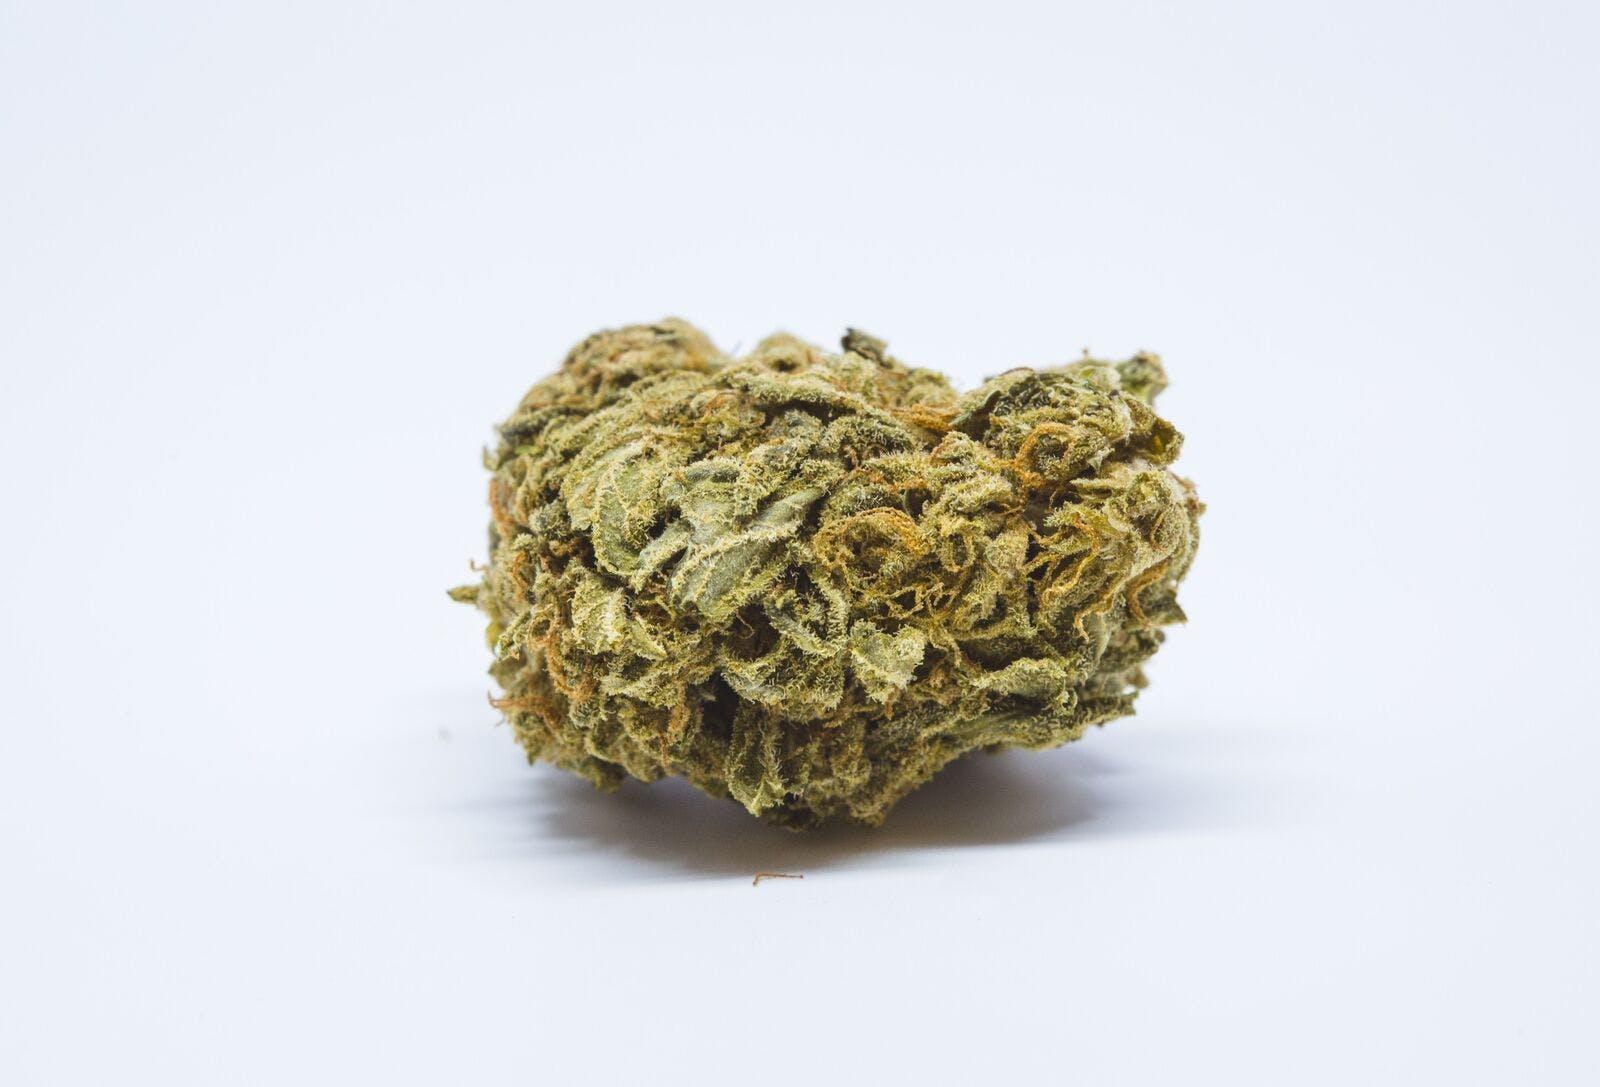 Blueberry Nuken Weed; Blueberry Nuken Cannabis Strain; Blueberry Nuken Indica Marijuana Strain